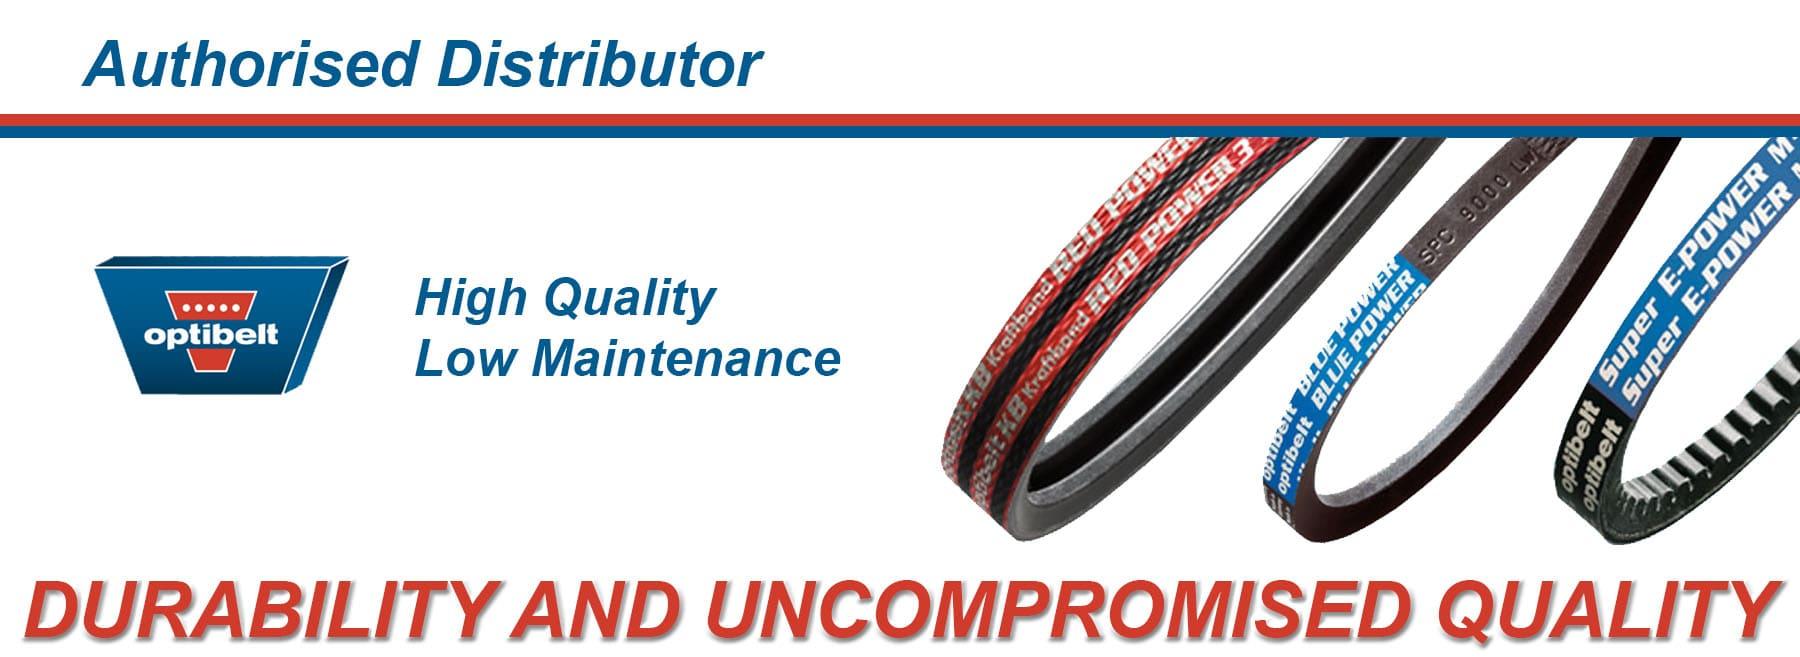 Optibelt - Authorised Distributor - Durability and uncompromised quality